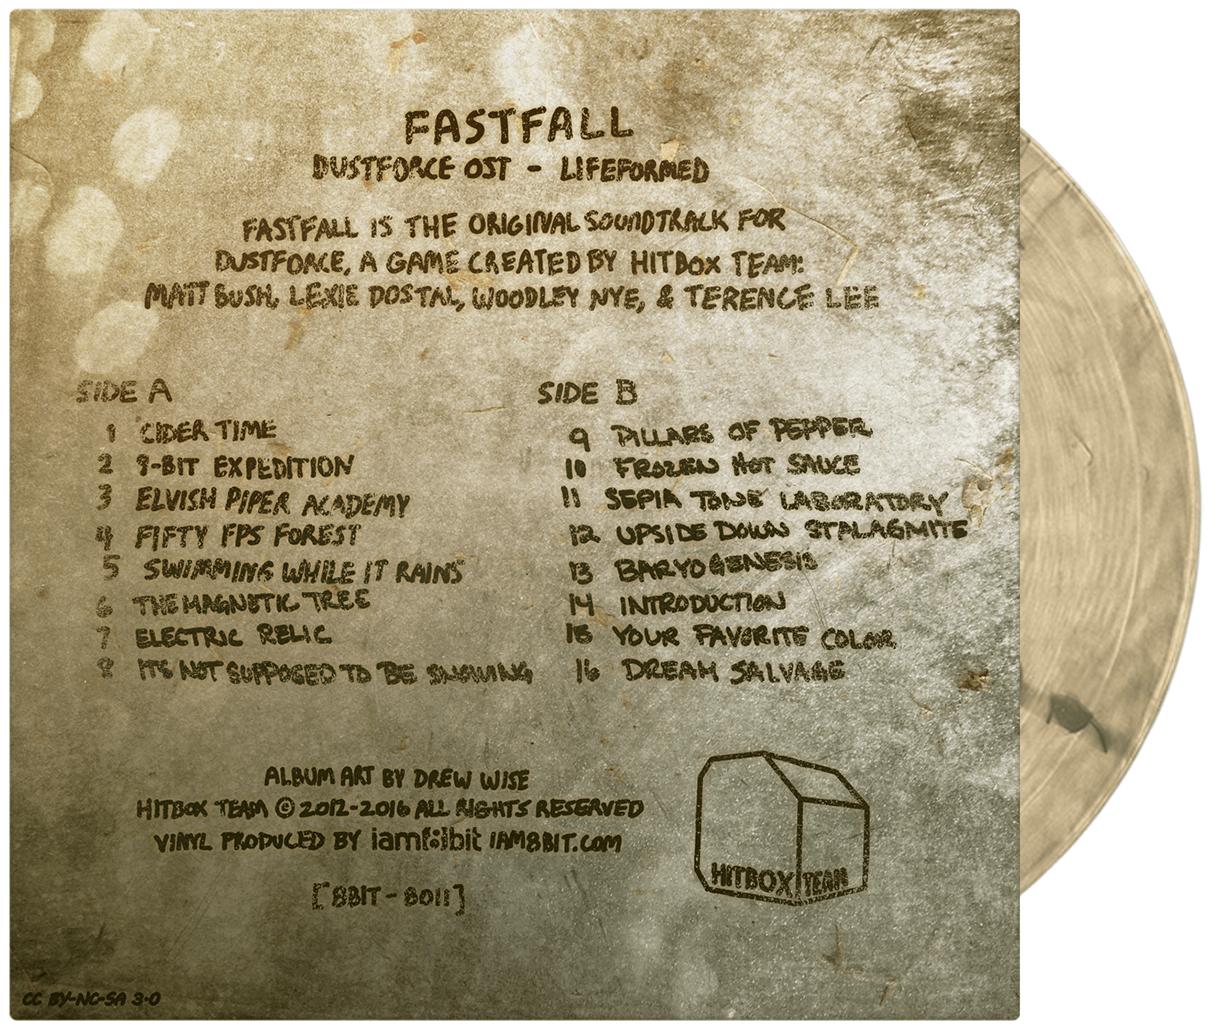 FASTFALL: DUSTFORCE VINYL SOUNDTRACK  / iam8bit